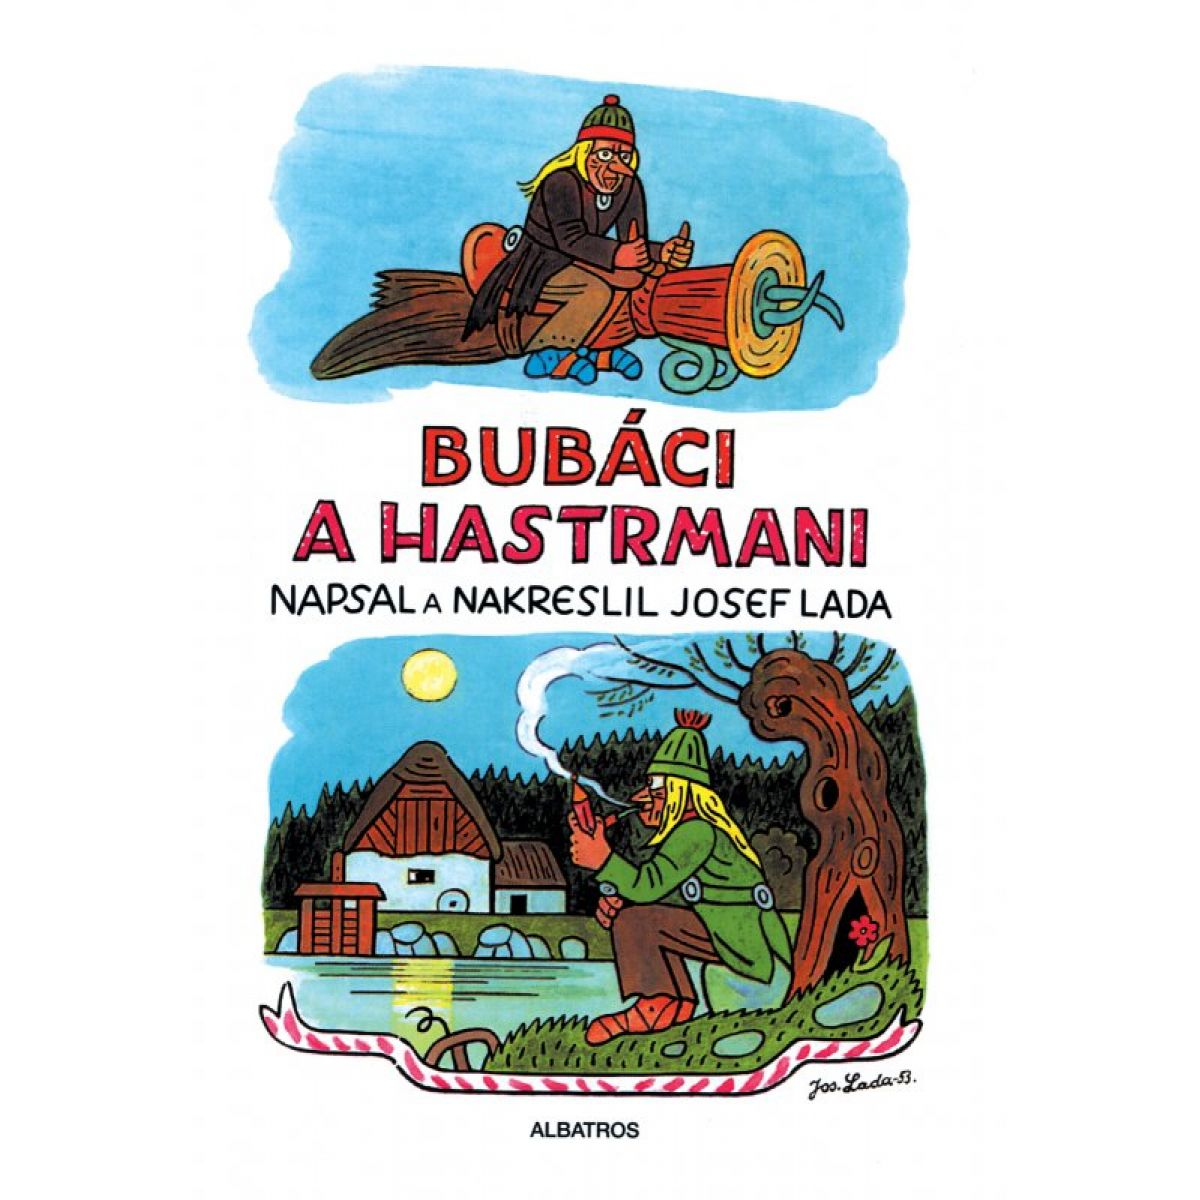 Bubáci a hastrmani - Josef Lada